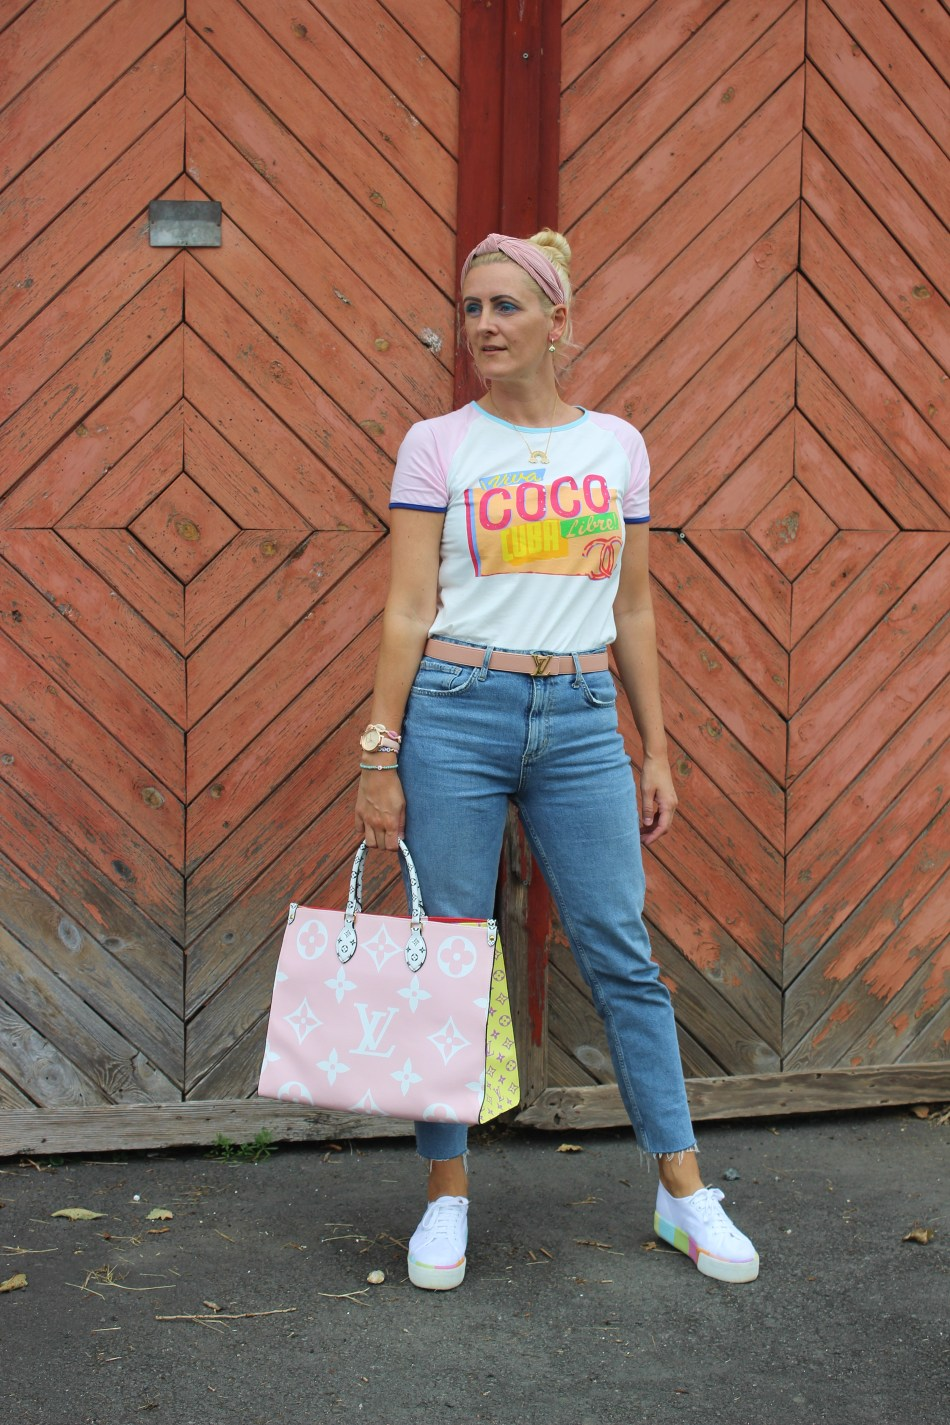 Denim-Jeans-Superga-Plateau-Sneakers-Louis-Vuitton-Onthego-Bag-Chanel-Shirt-Haarreifen-Trend-carrieslifestyle-Tamara-Prutsch